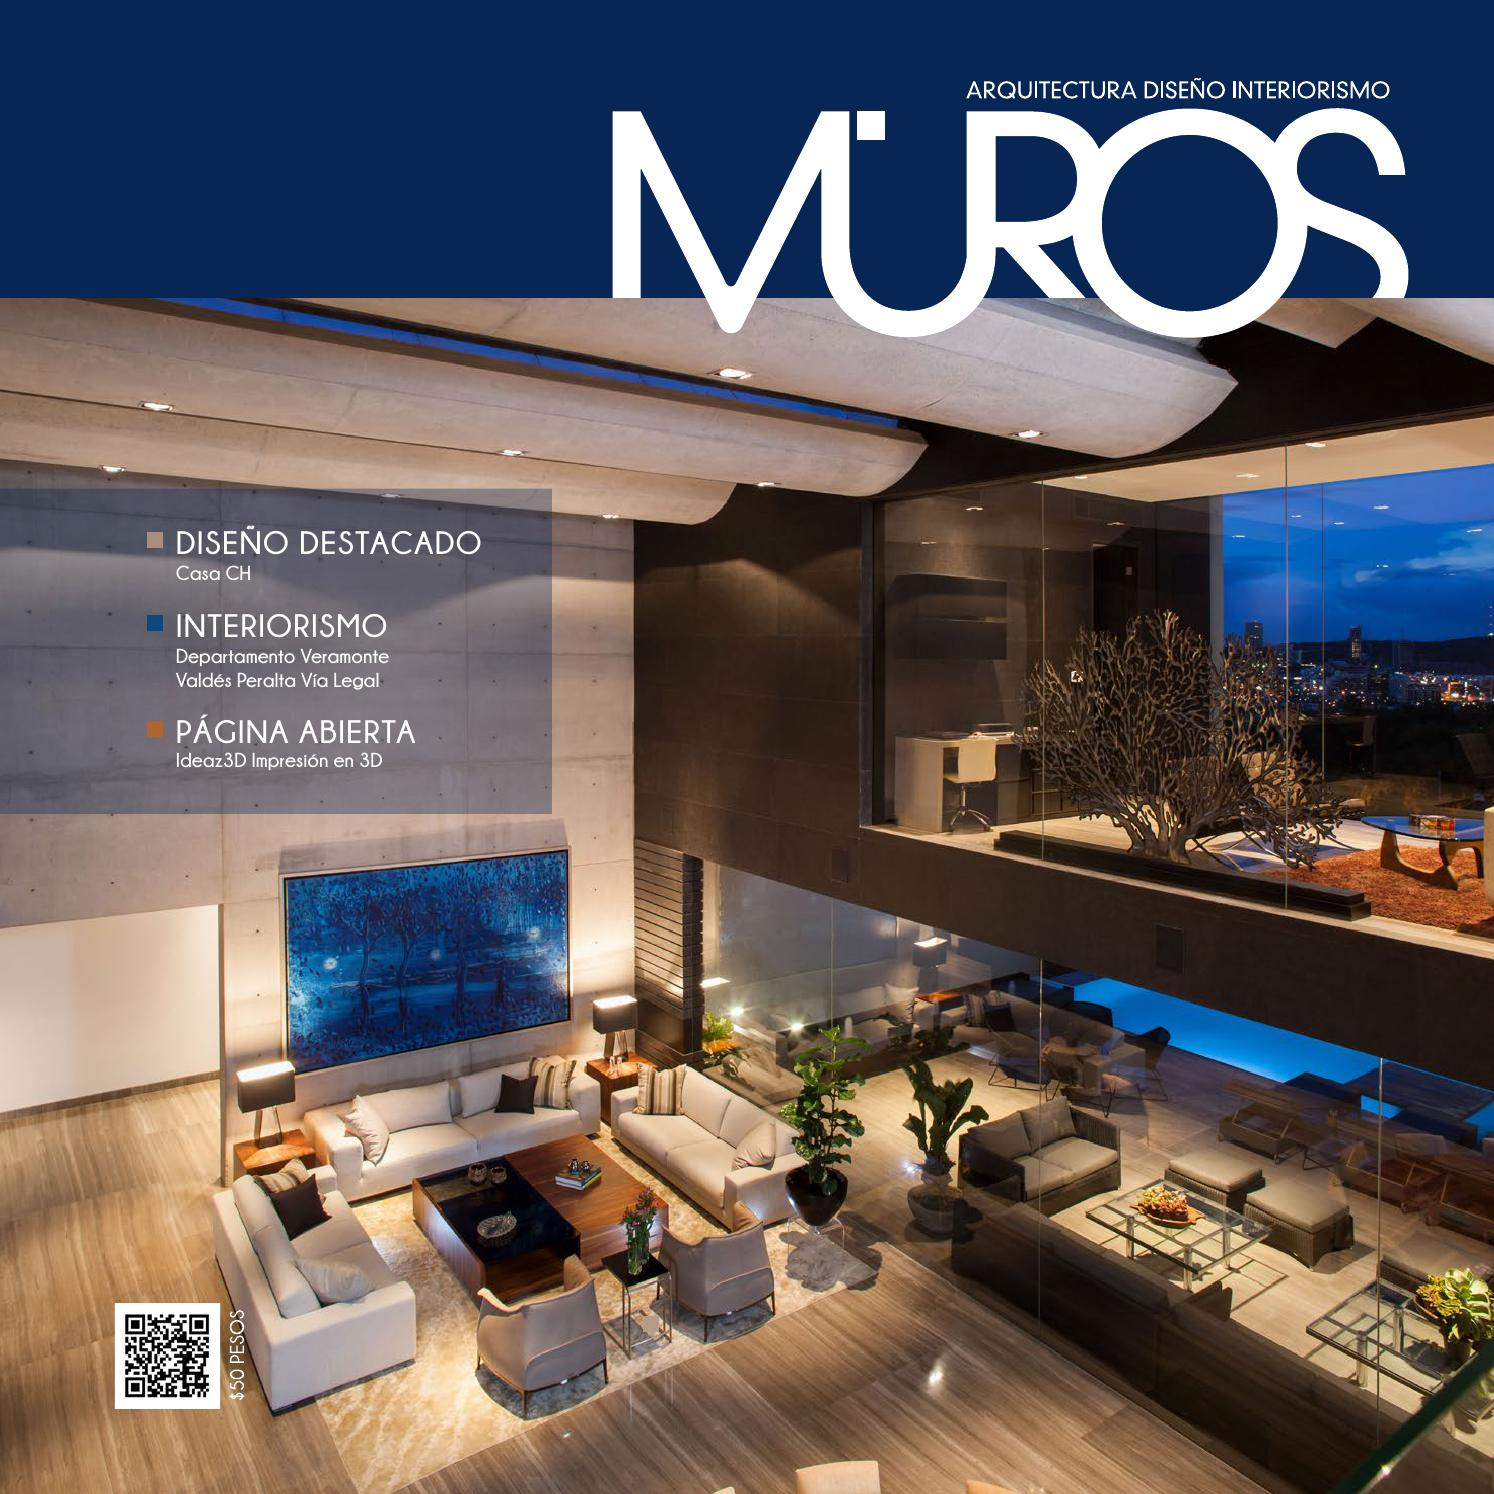 edici n 8 revista muros arquitectura dise o interiorismo